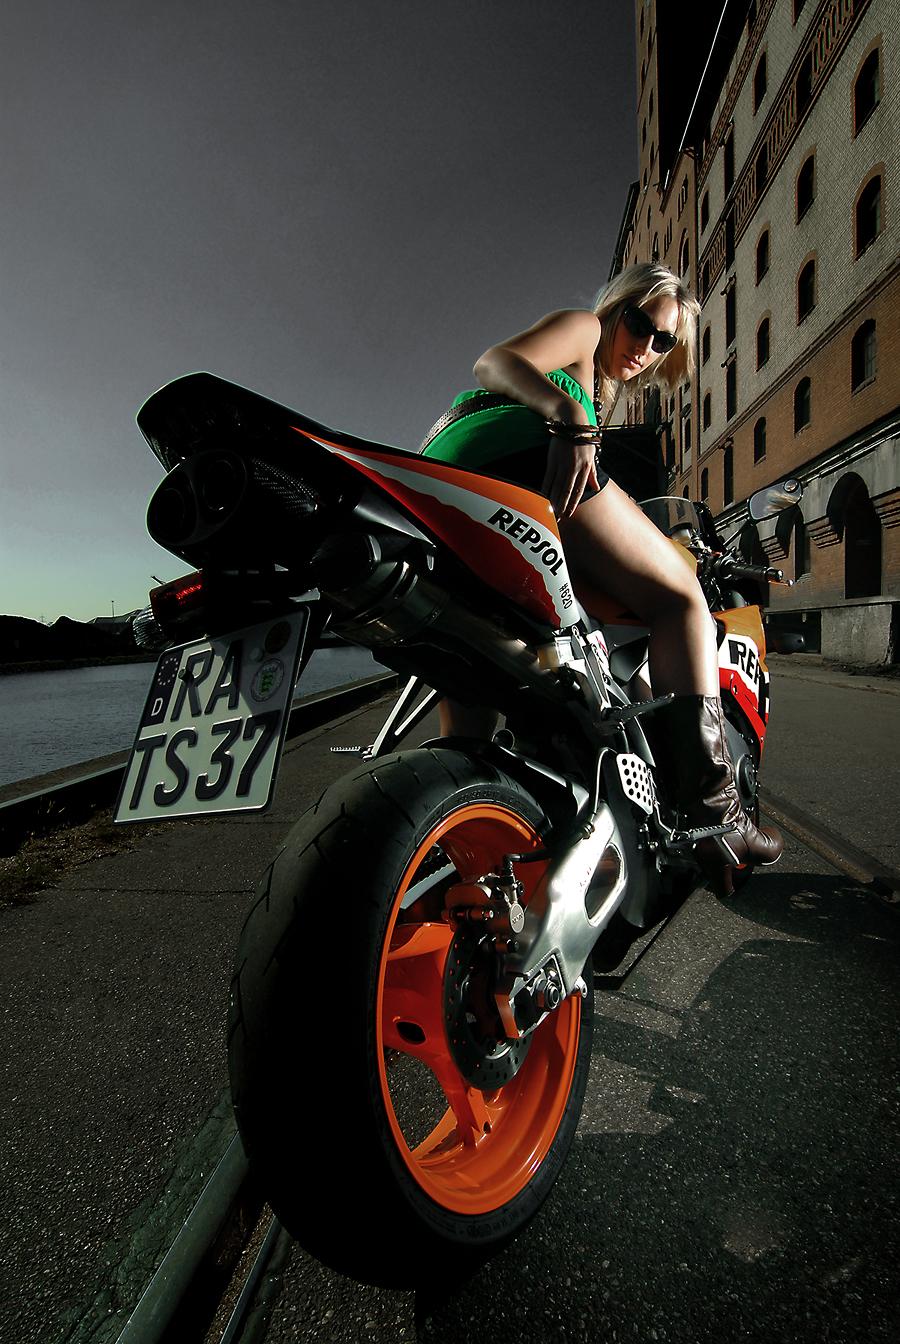 Savas Turanci Fotografie_Repsol_Honda CBR 1100